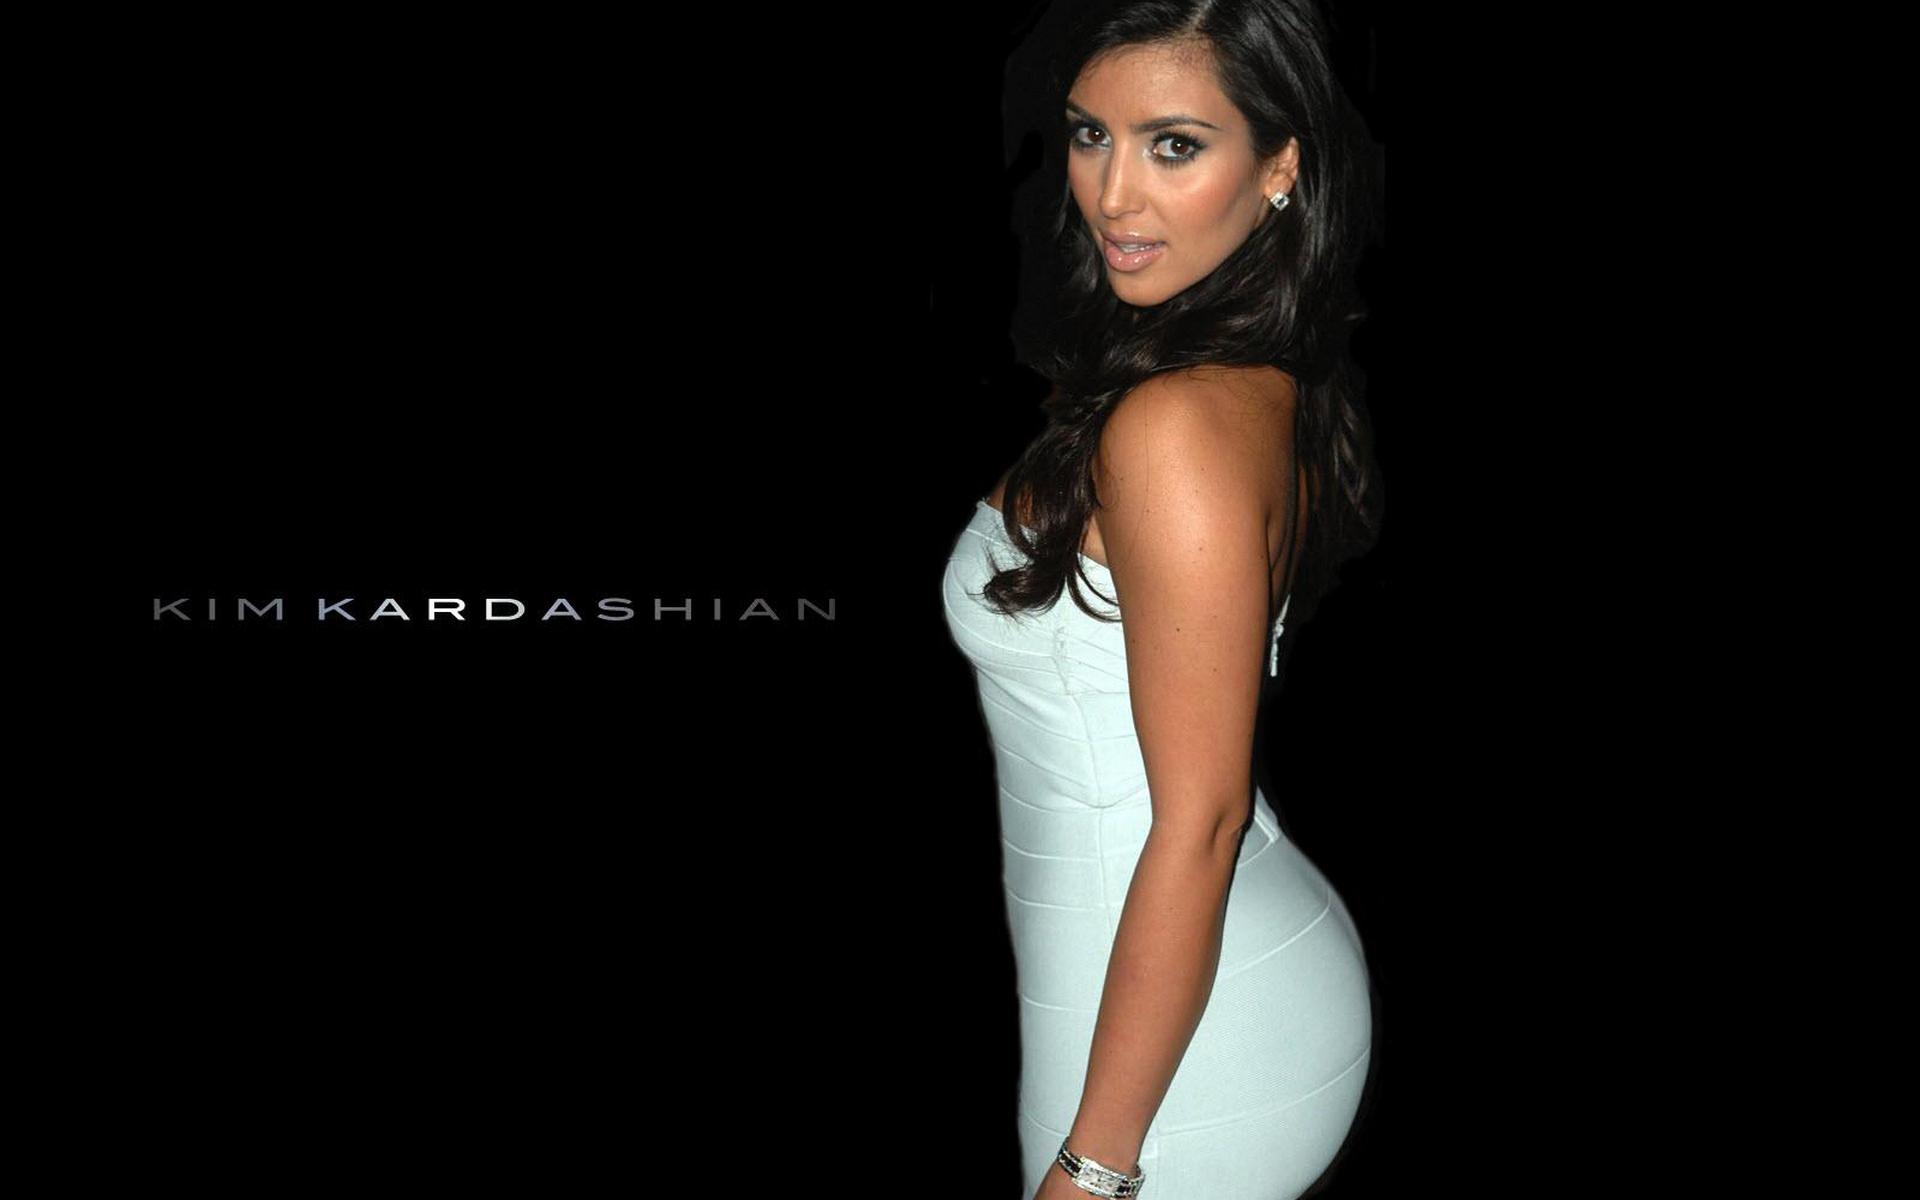 Hot Naked Pics Of Kim Kardashian